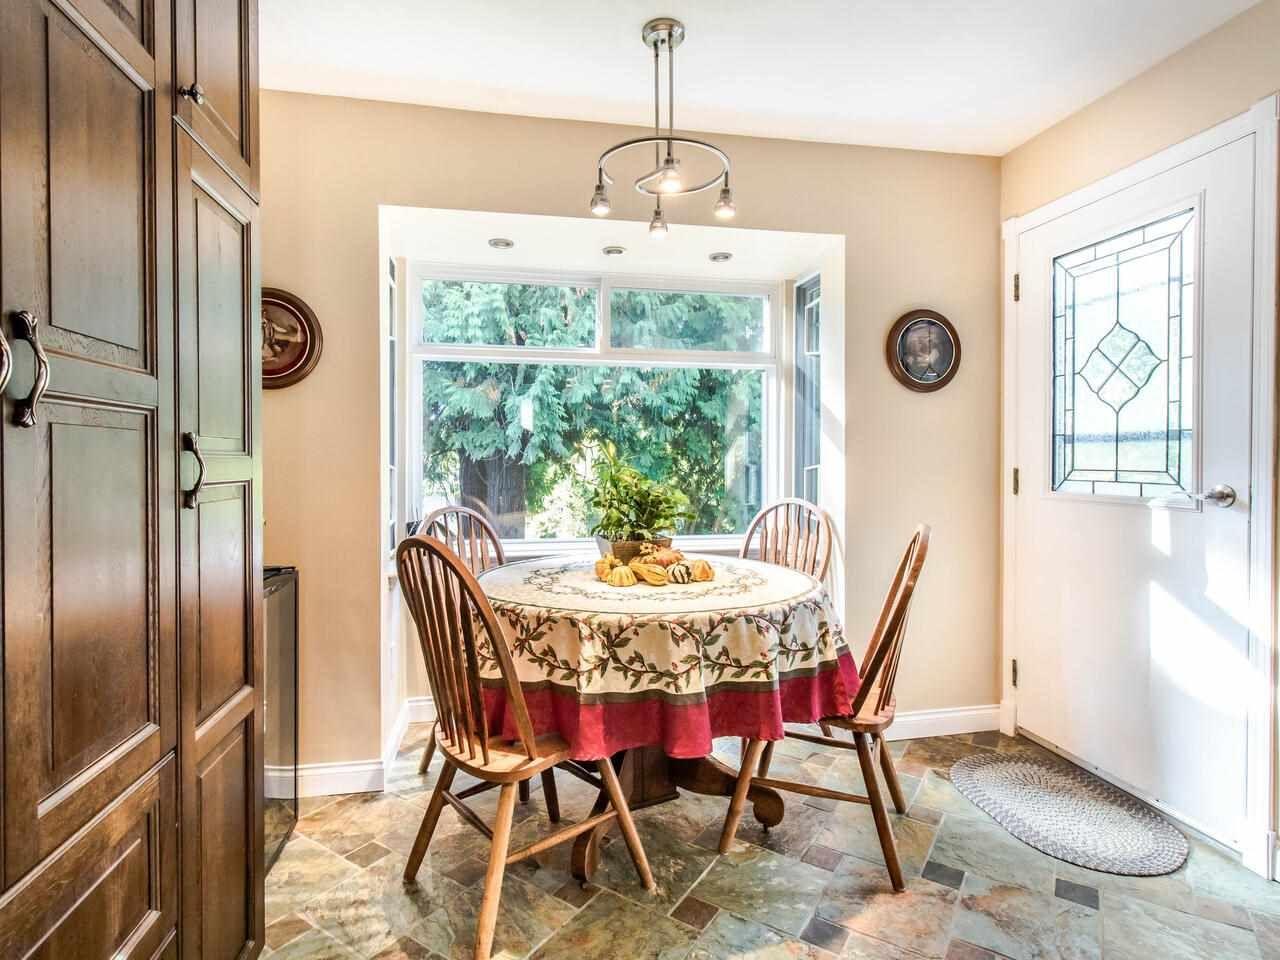 Photo 7: Photos: 11505 PEMBERTON Crescent in Delta: Annieville House for sale (N. Delta)  : MLS®# R2512135